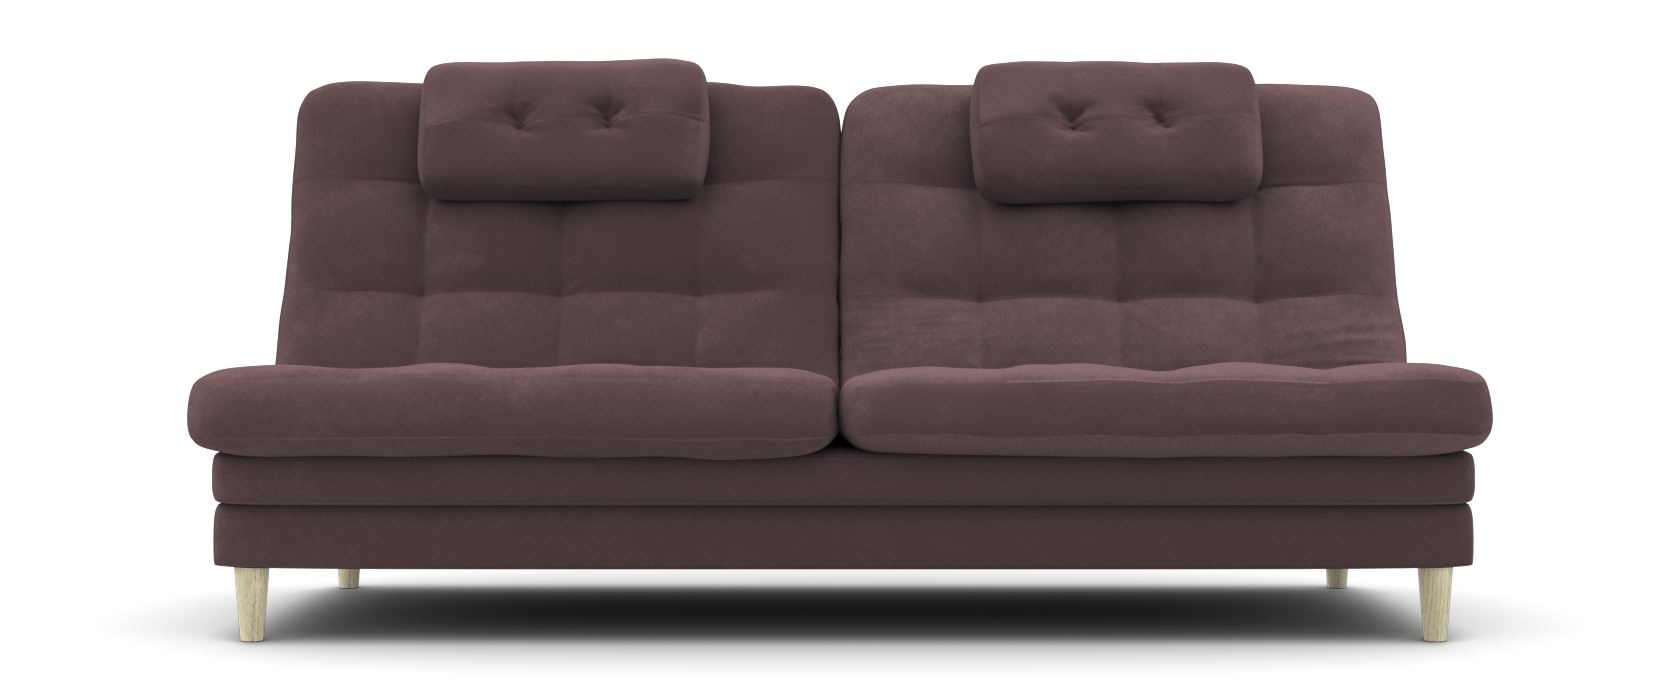 Трехместный диван Dino - Pufetto